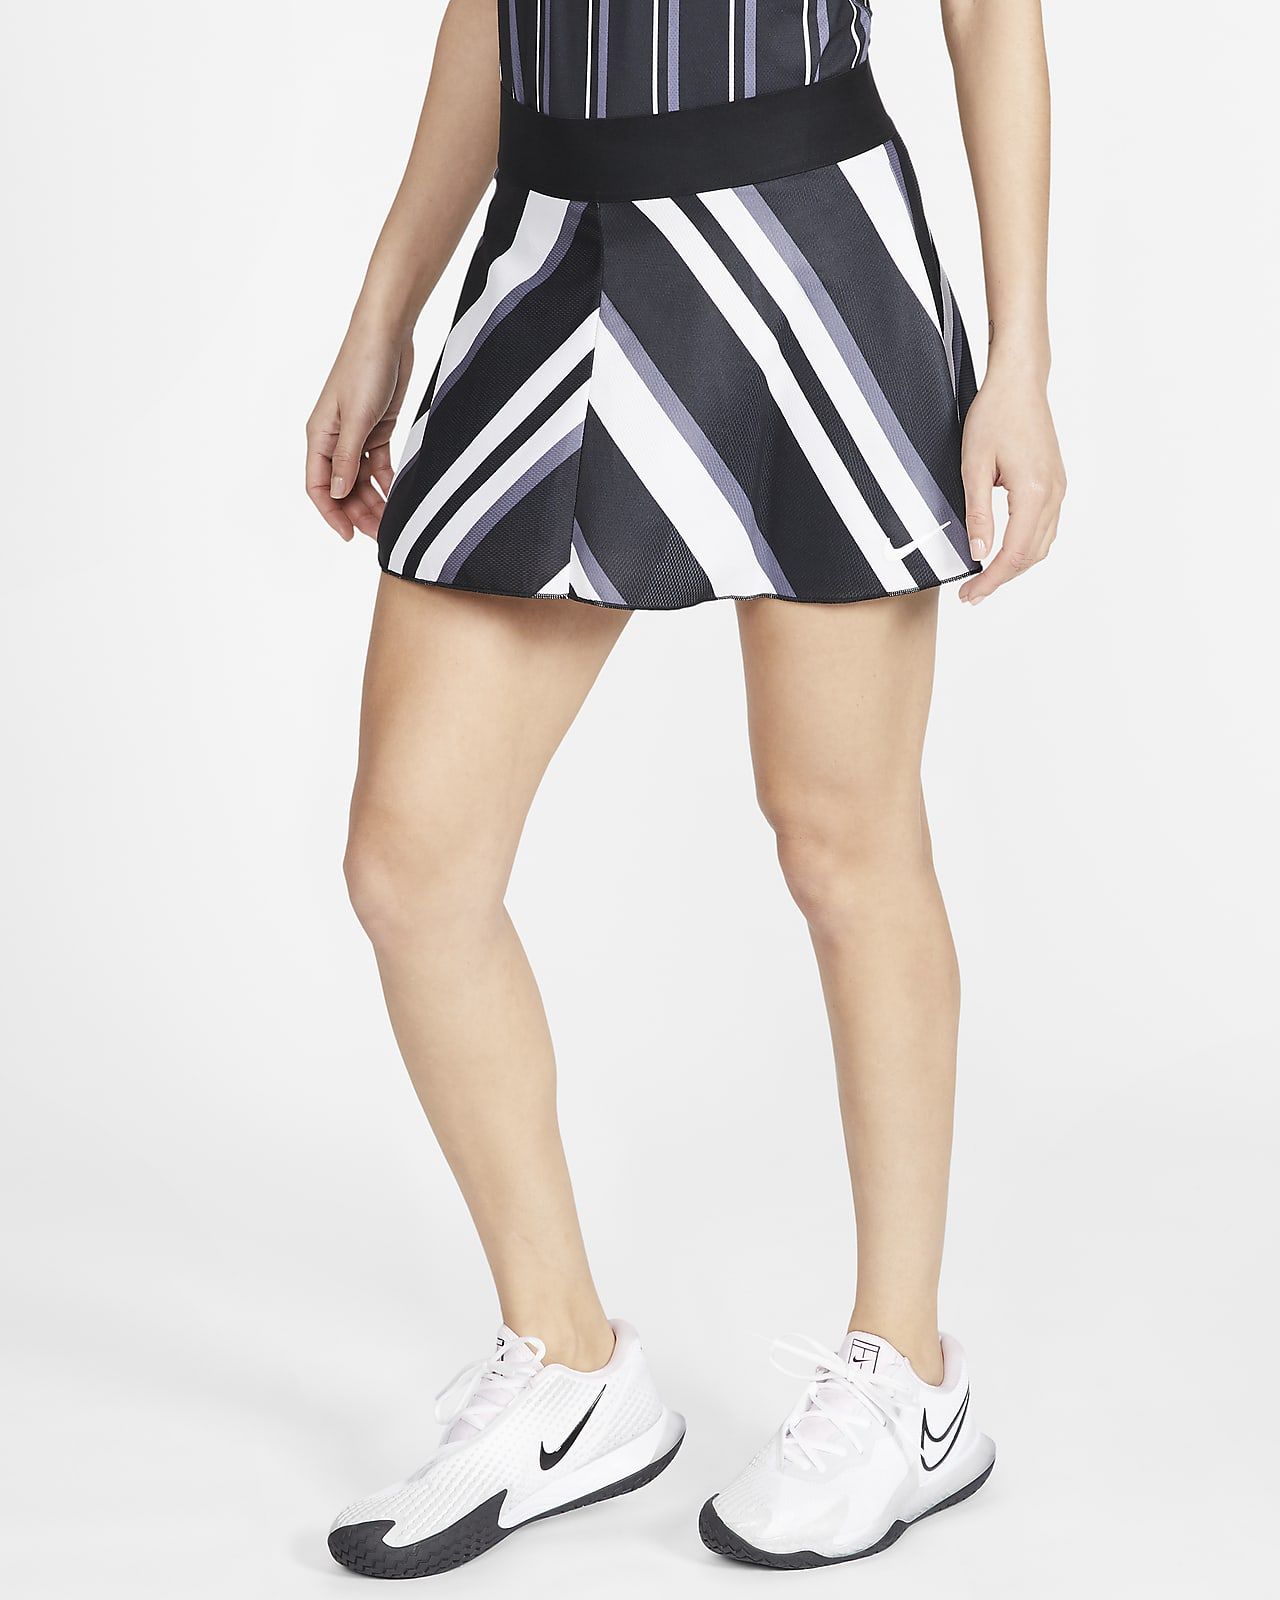 NikeCourt Dri-FIT Women's Printed Tennis Skirt